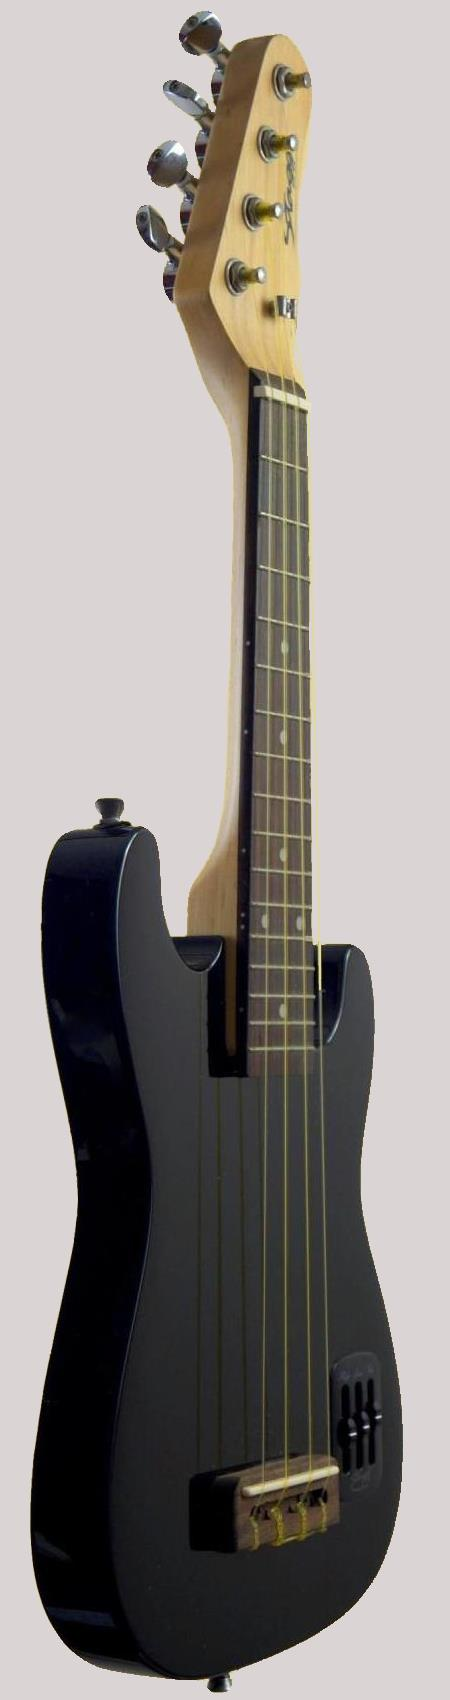 black stagg S1 stratocaster Ukulele